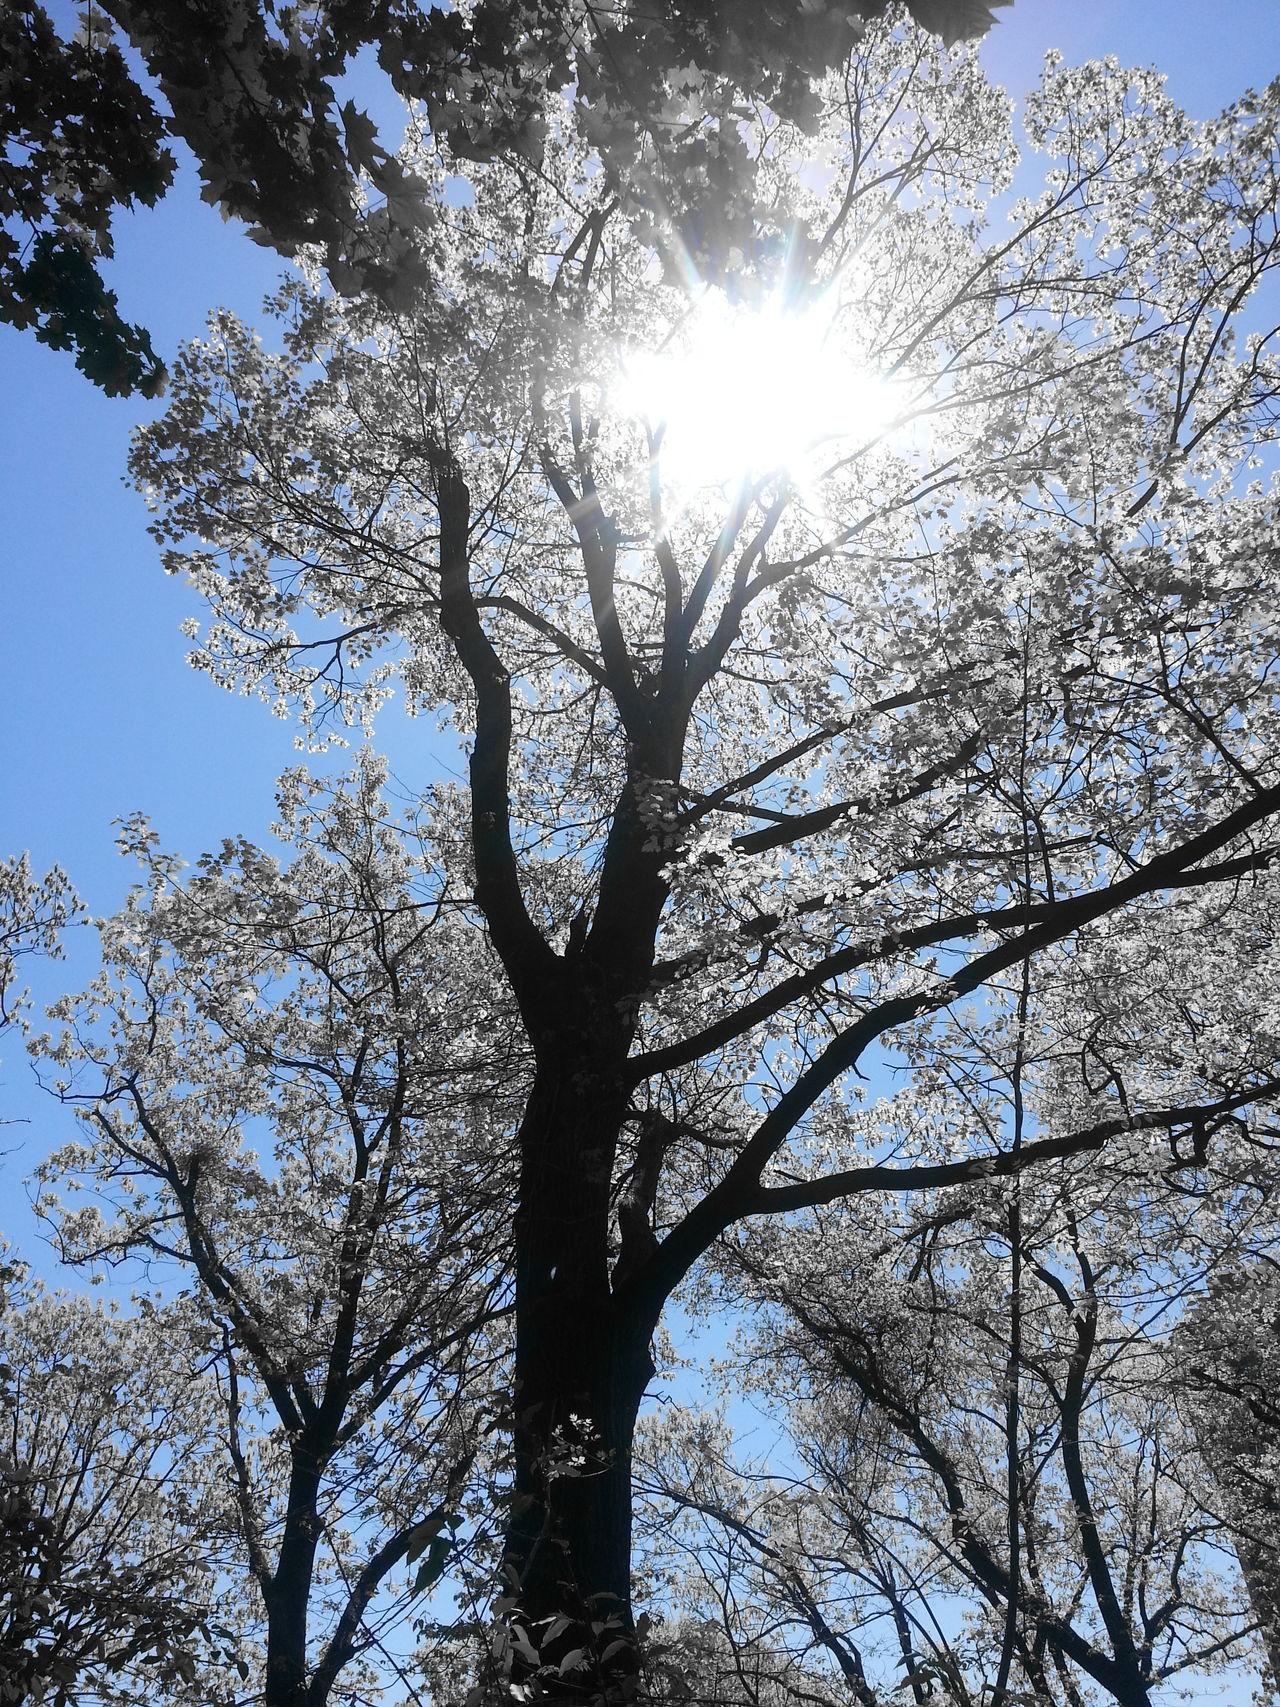 Harlem Riverr Park Washington Heights Trees Sun Branches Blackandblue